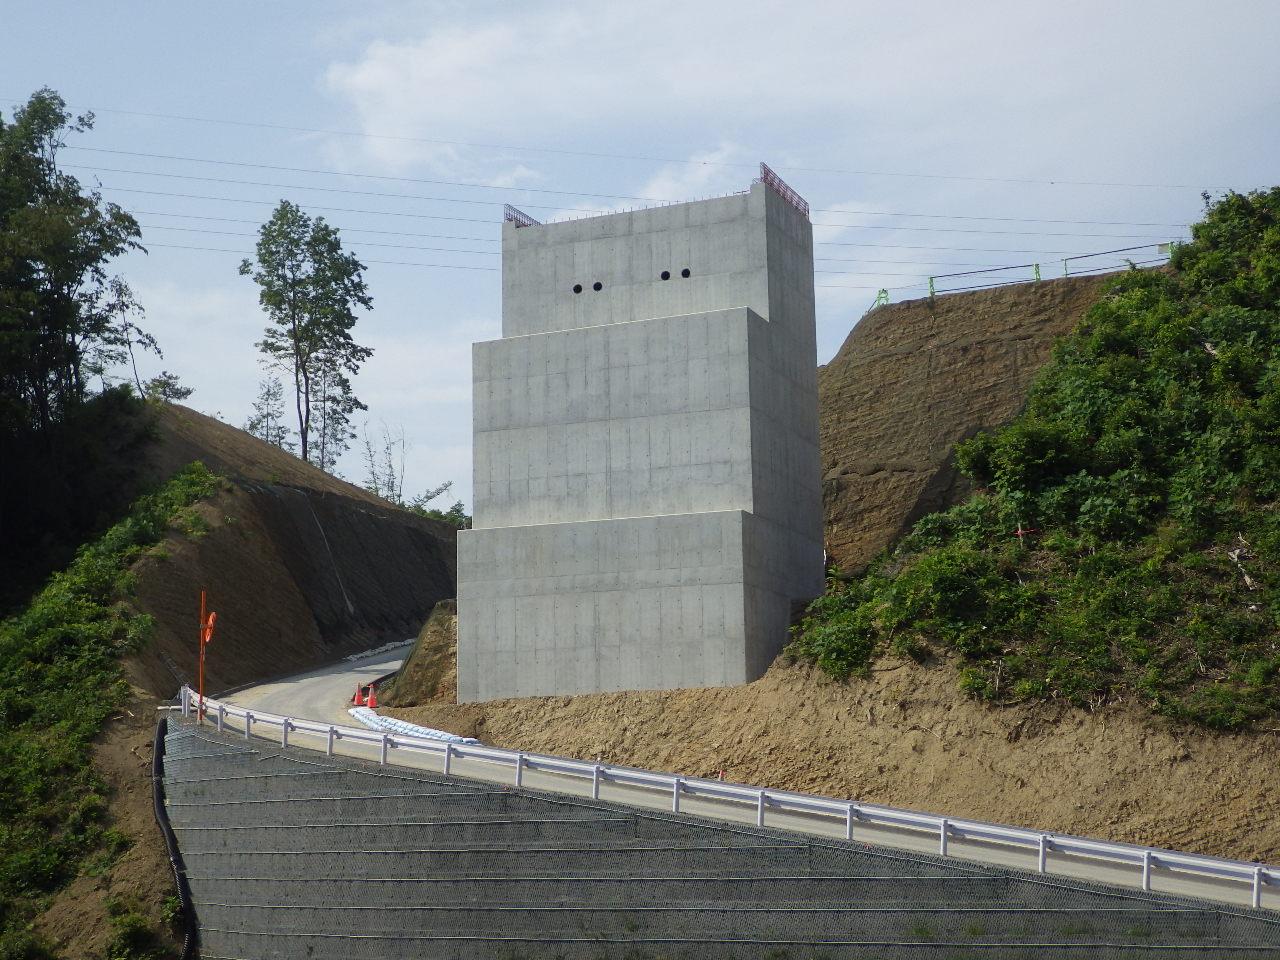 総簡加)道路改築工事((仮称)7号橋下部工その2)